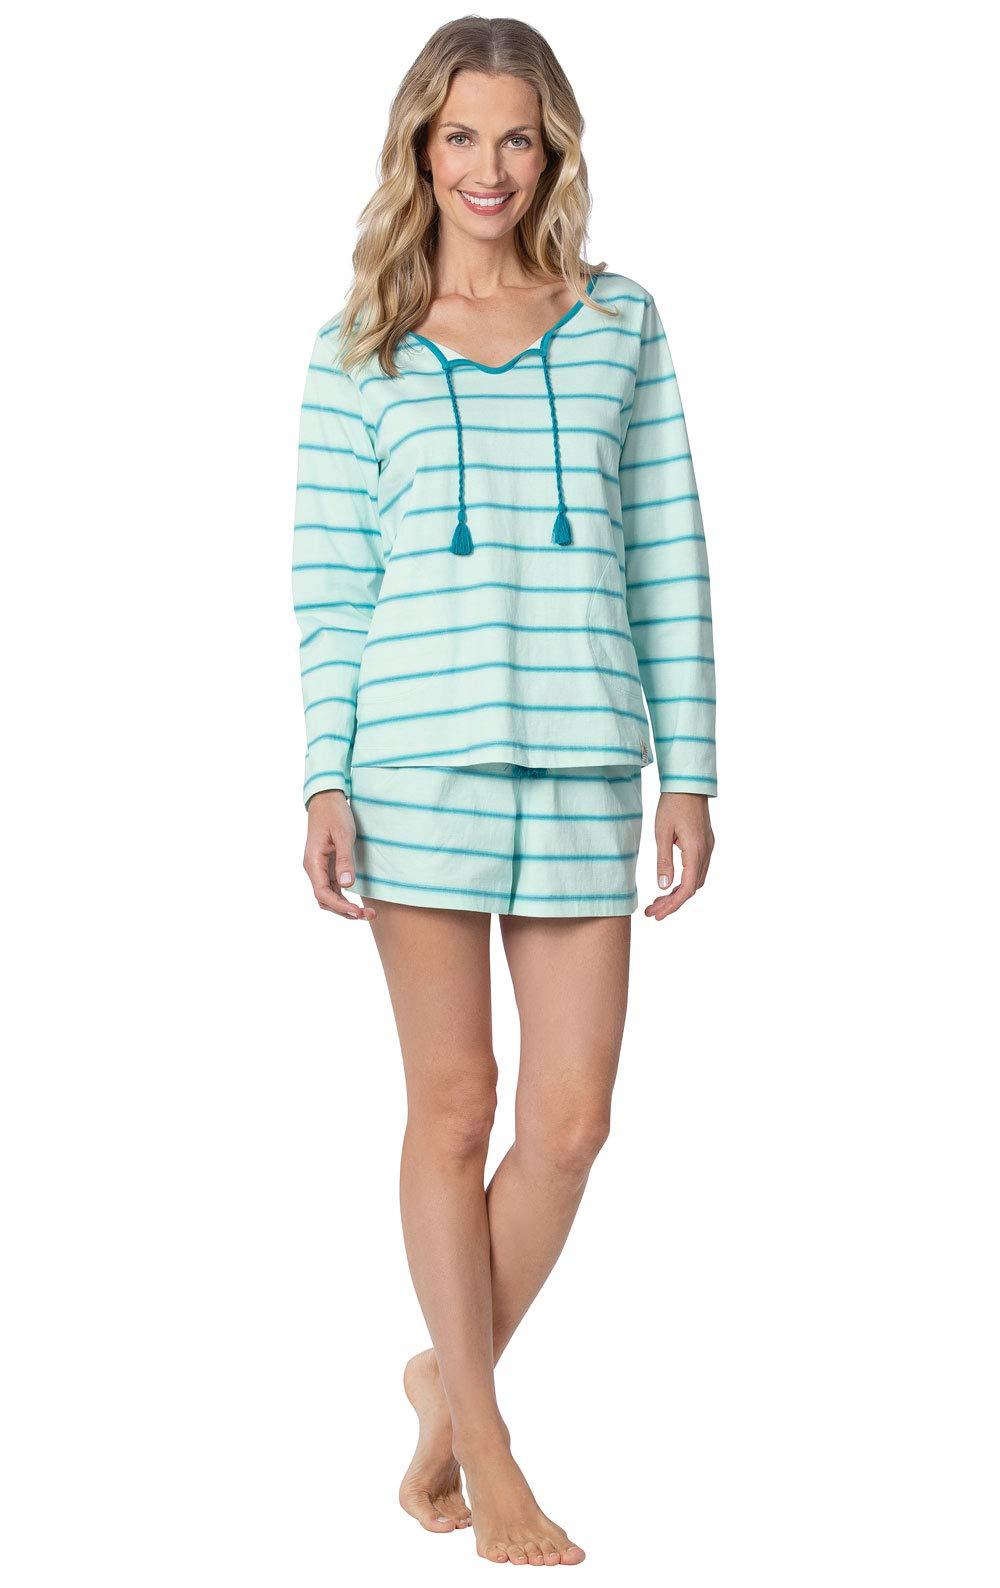 Margaritaville Pajamas for Women Fun - Womens PJs by PajamaGram, Aqua, M, 8-10 by PajamaGram